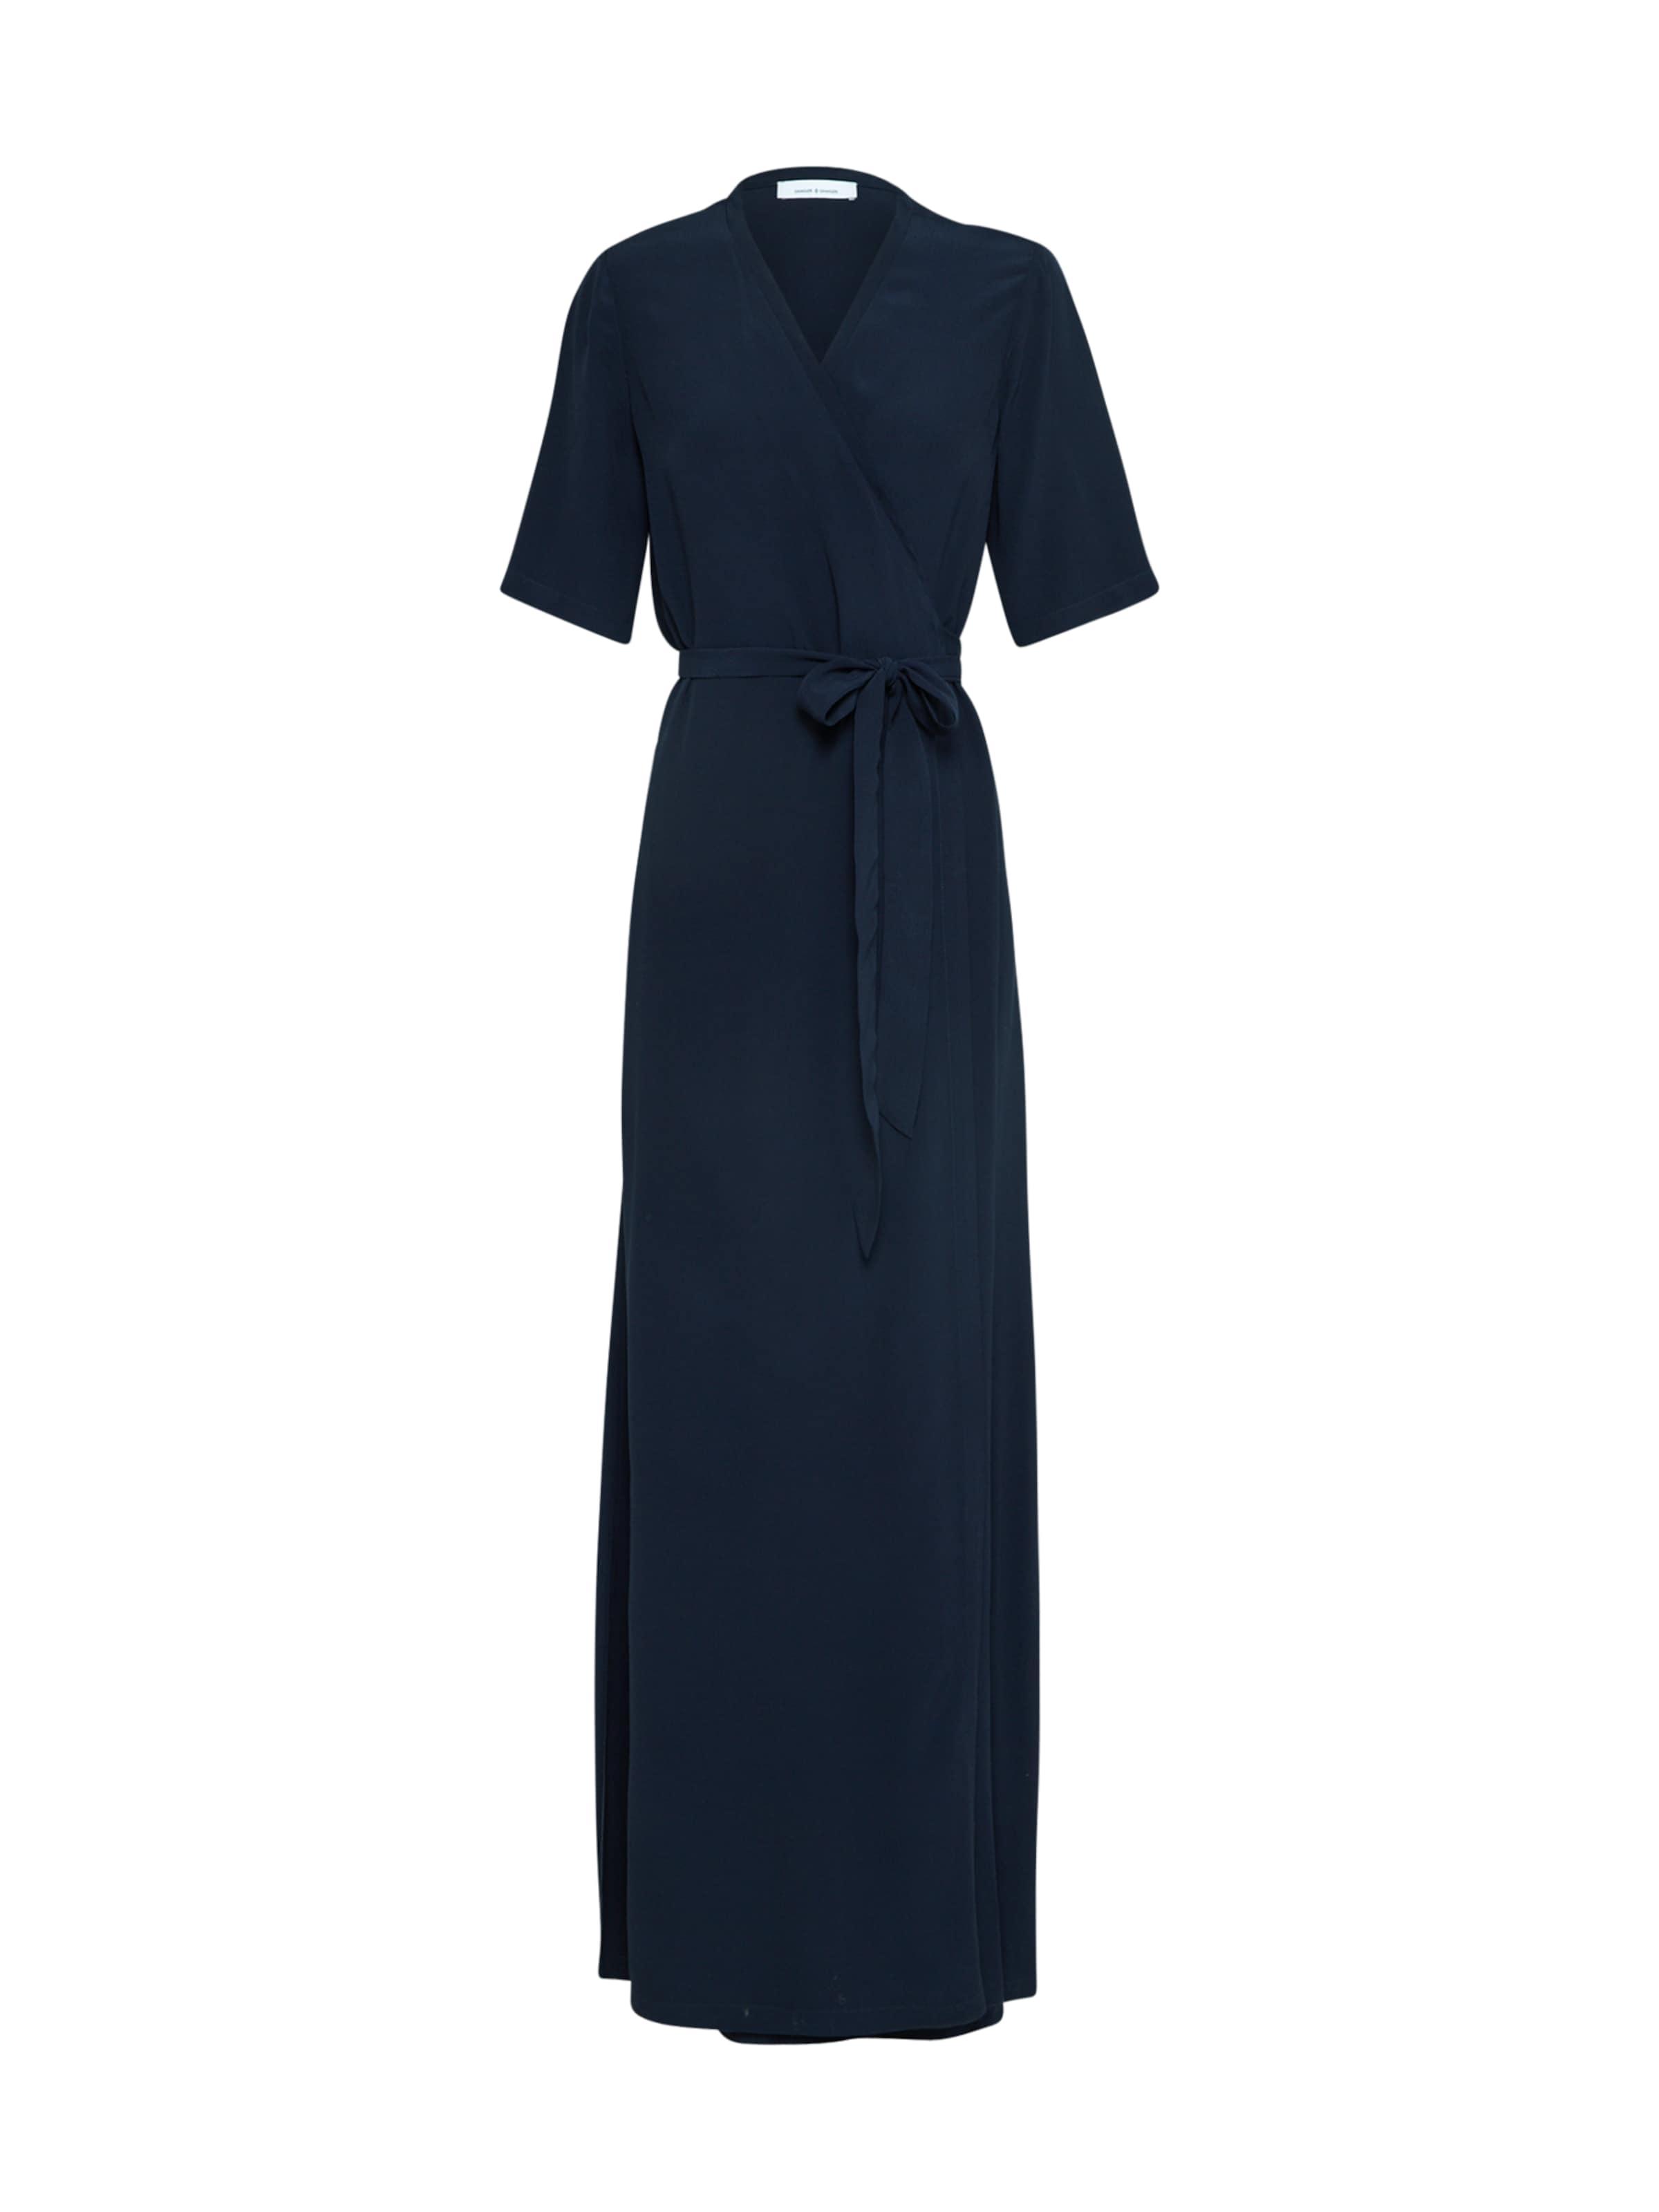 Samsoeamp; Nuit En Bleu De Soirée Robe m8PnwOyvN0